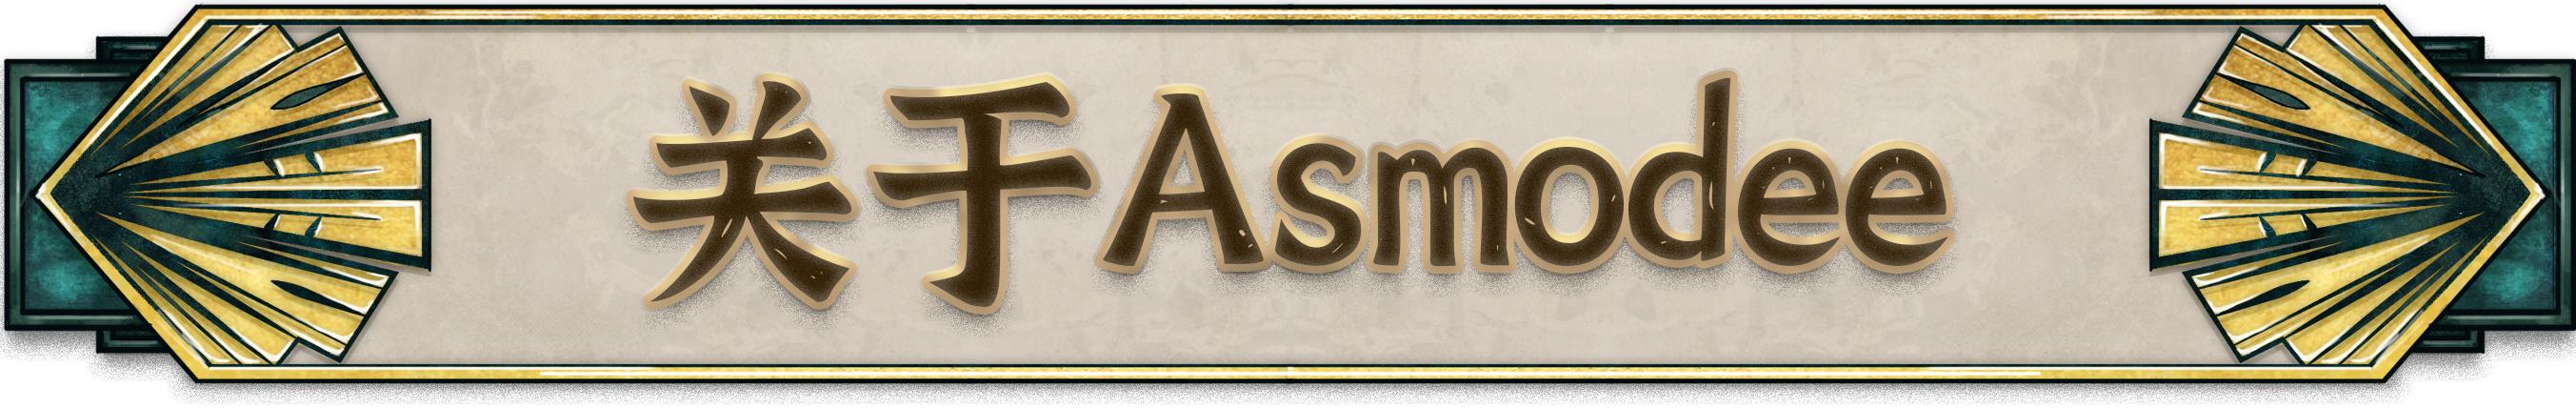 titre-ks-关于Asmodee.jpg